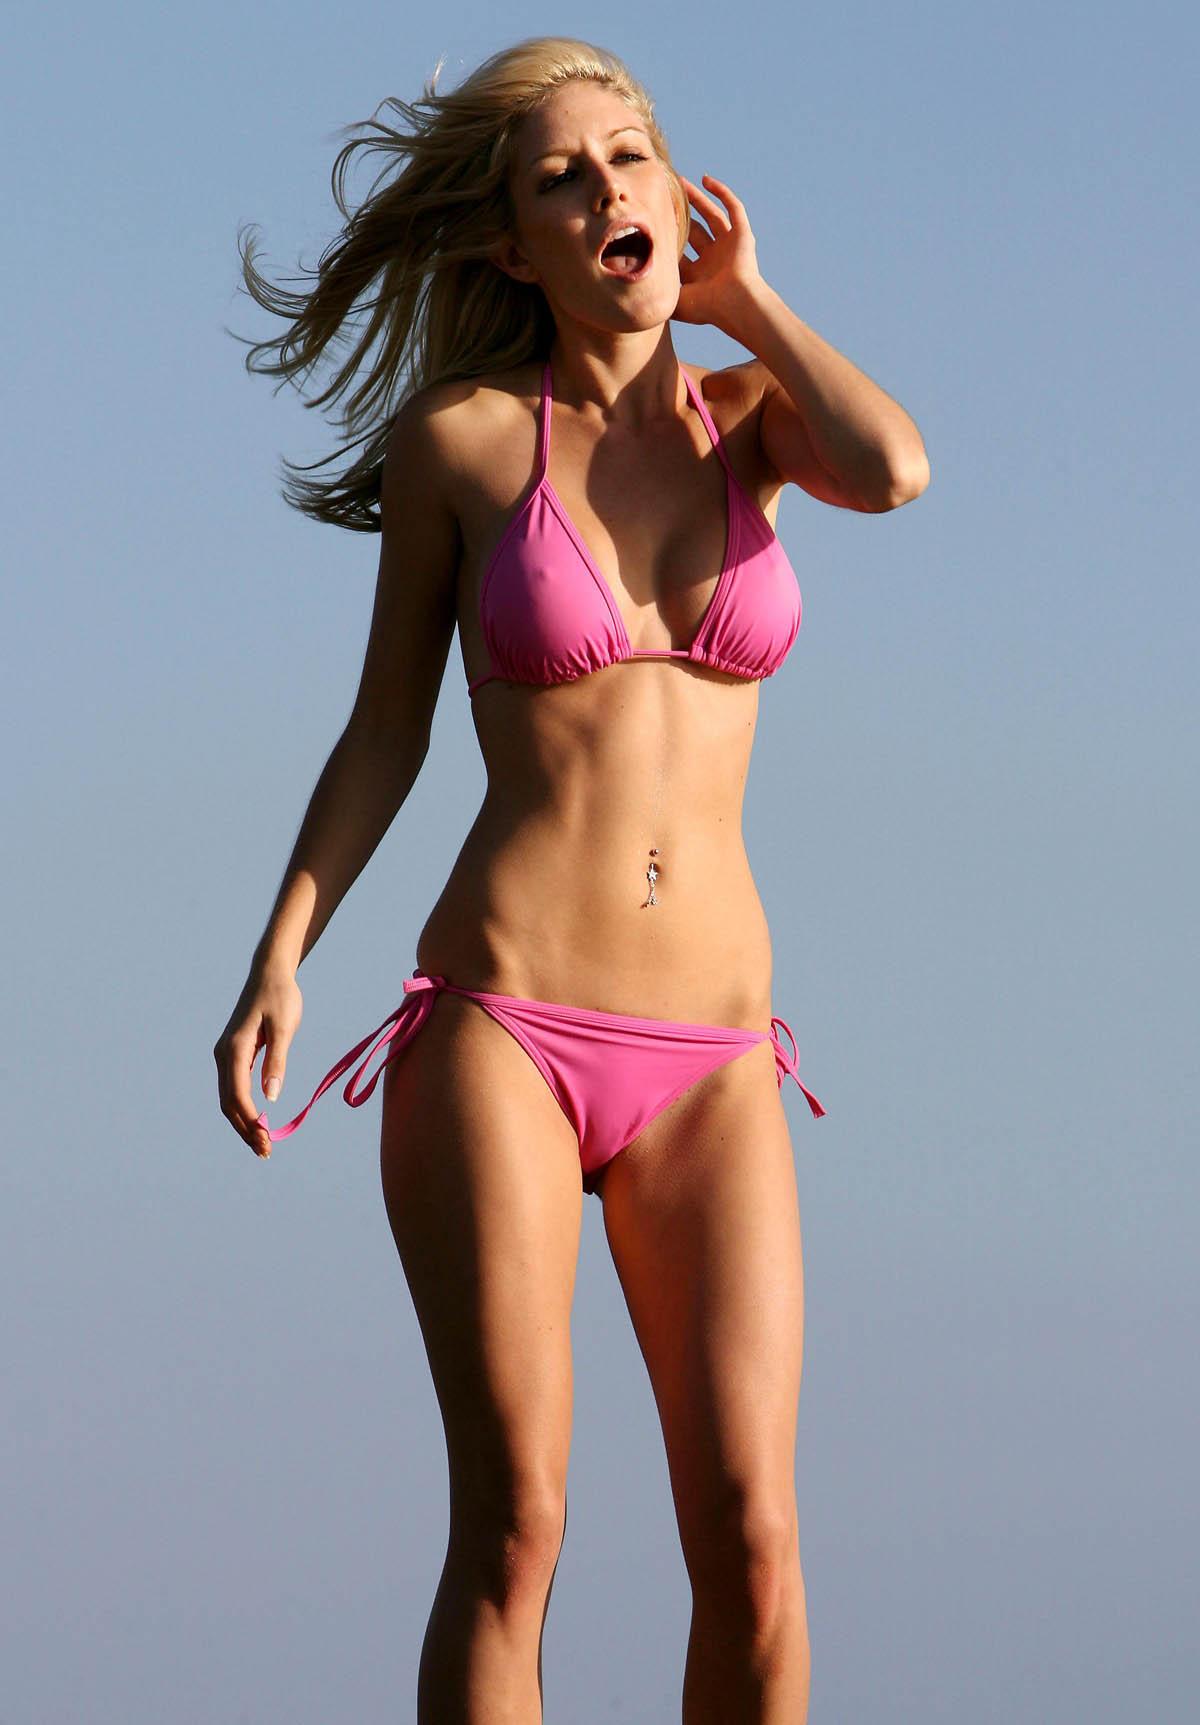 Фото девушек в розовых мини бикини 25 фотография